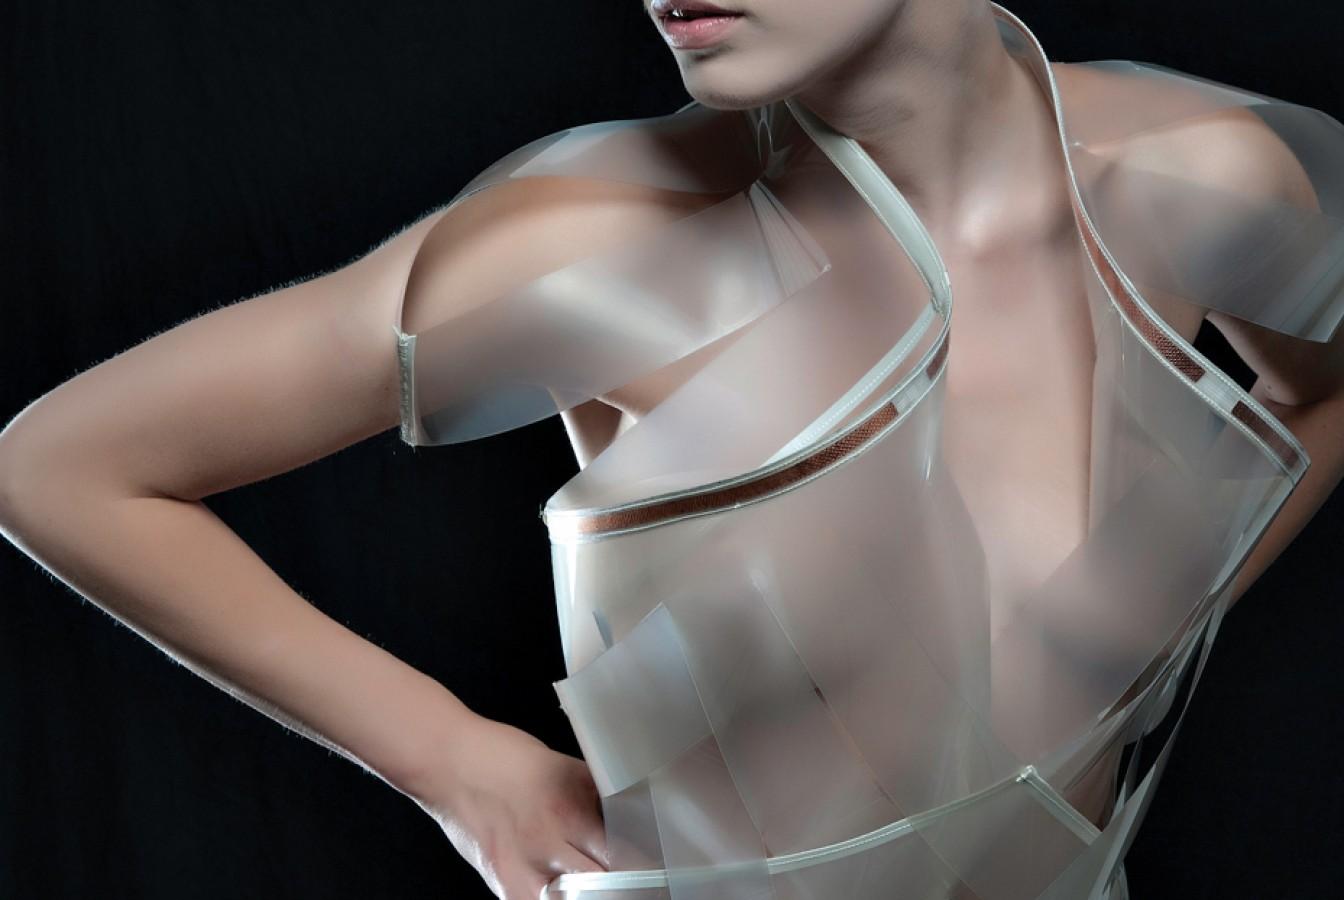 Vestido que transparenta